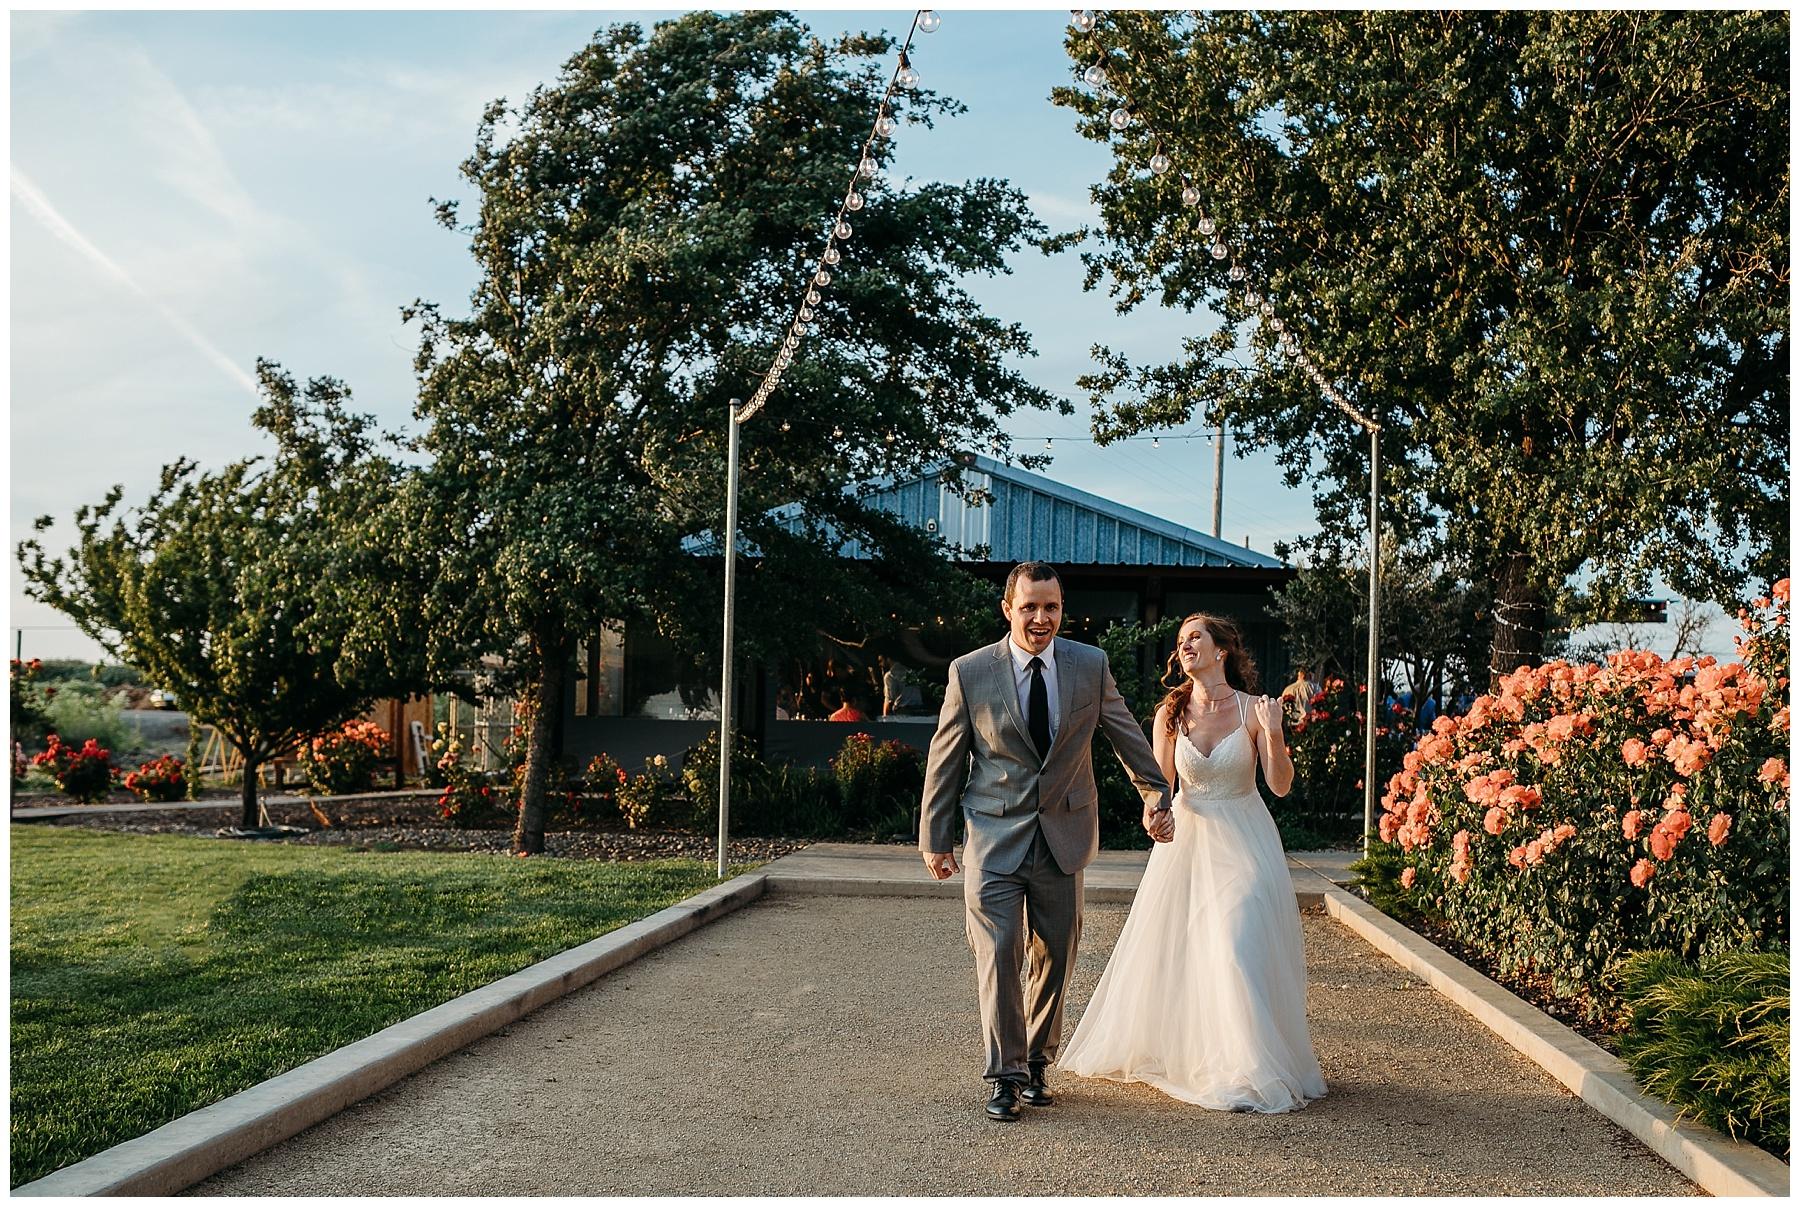 bride and groom walking away Julietta Winery sunset photos